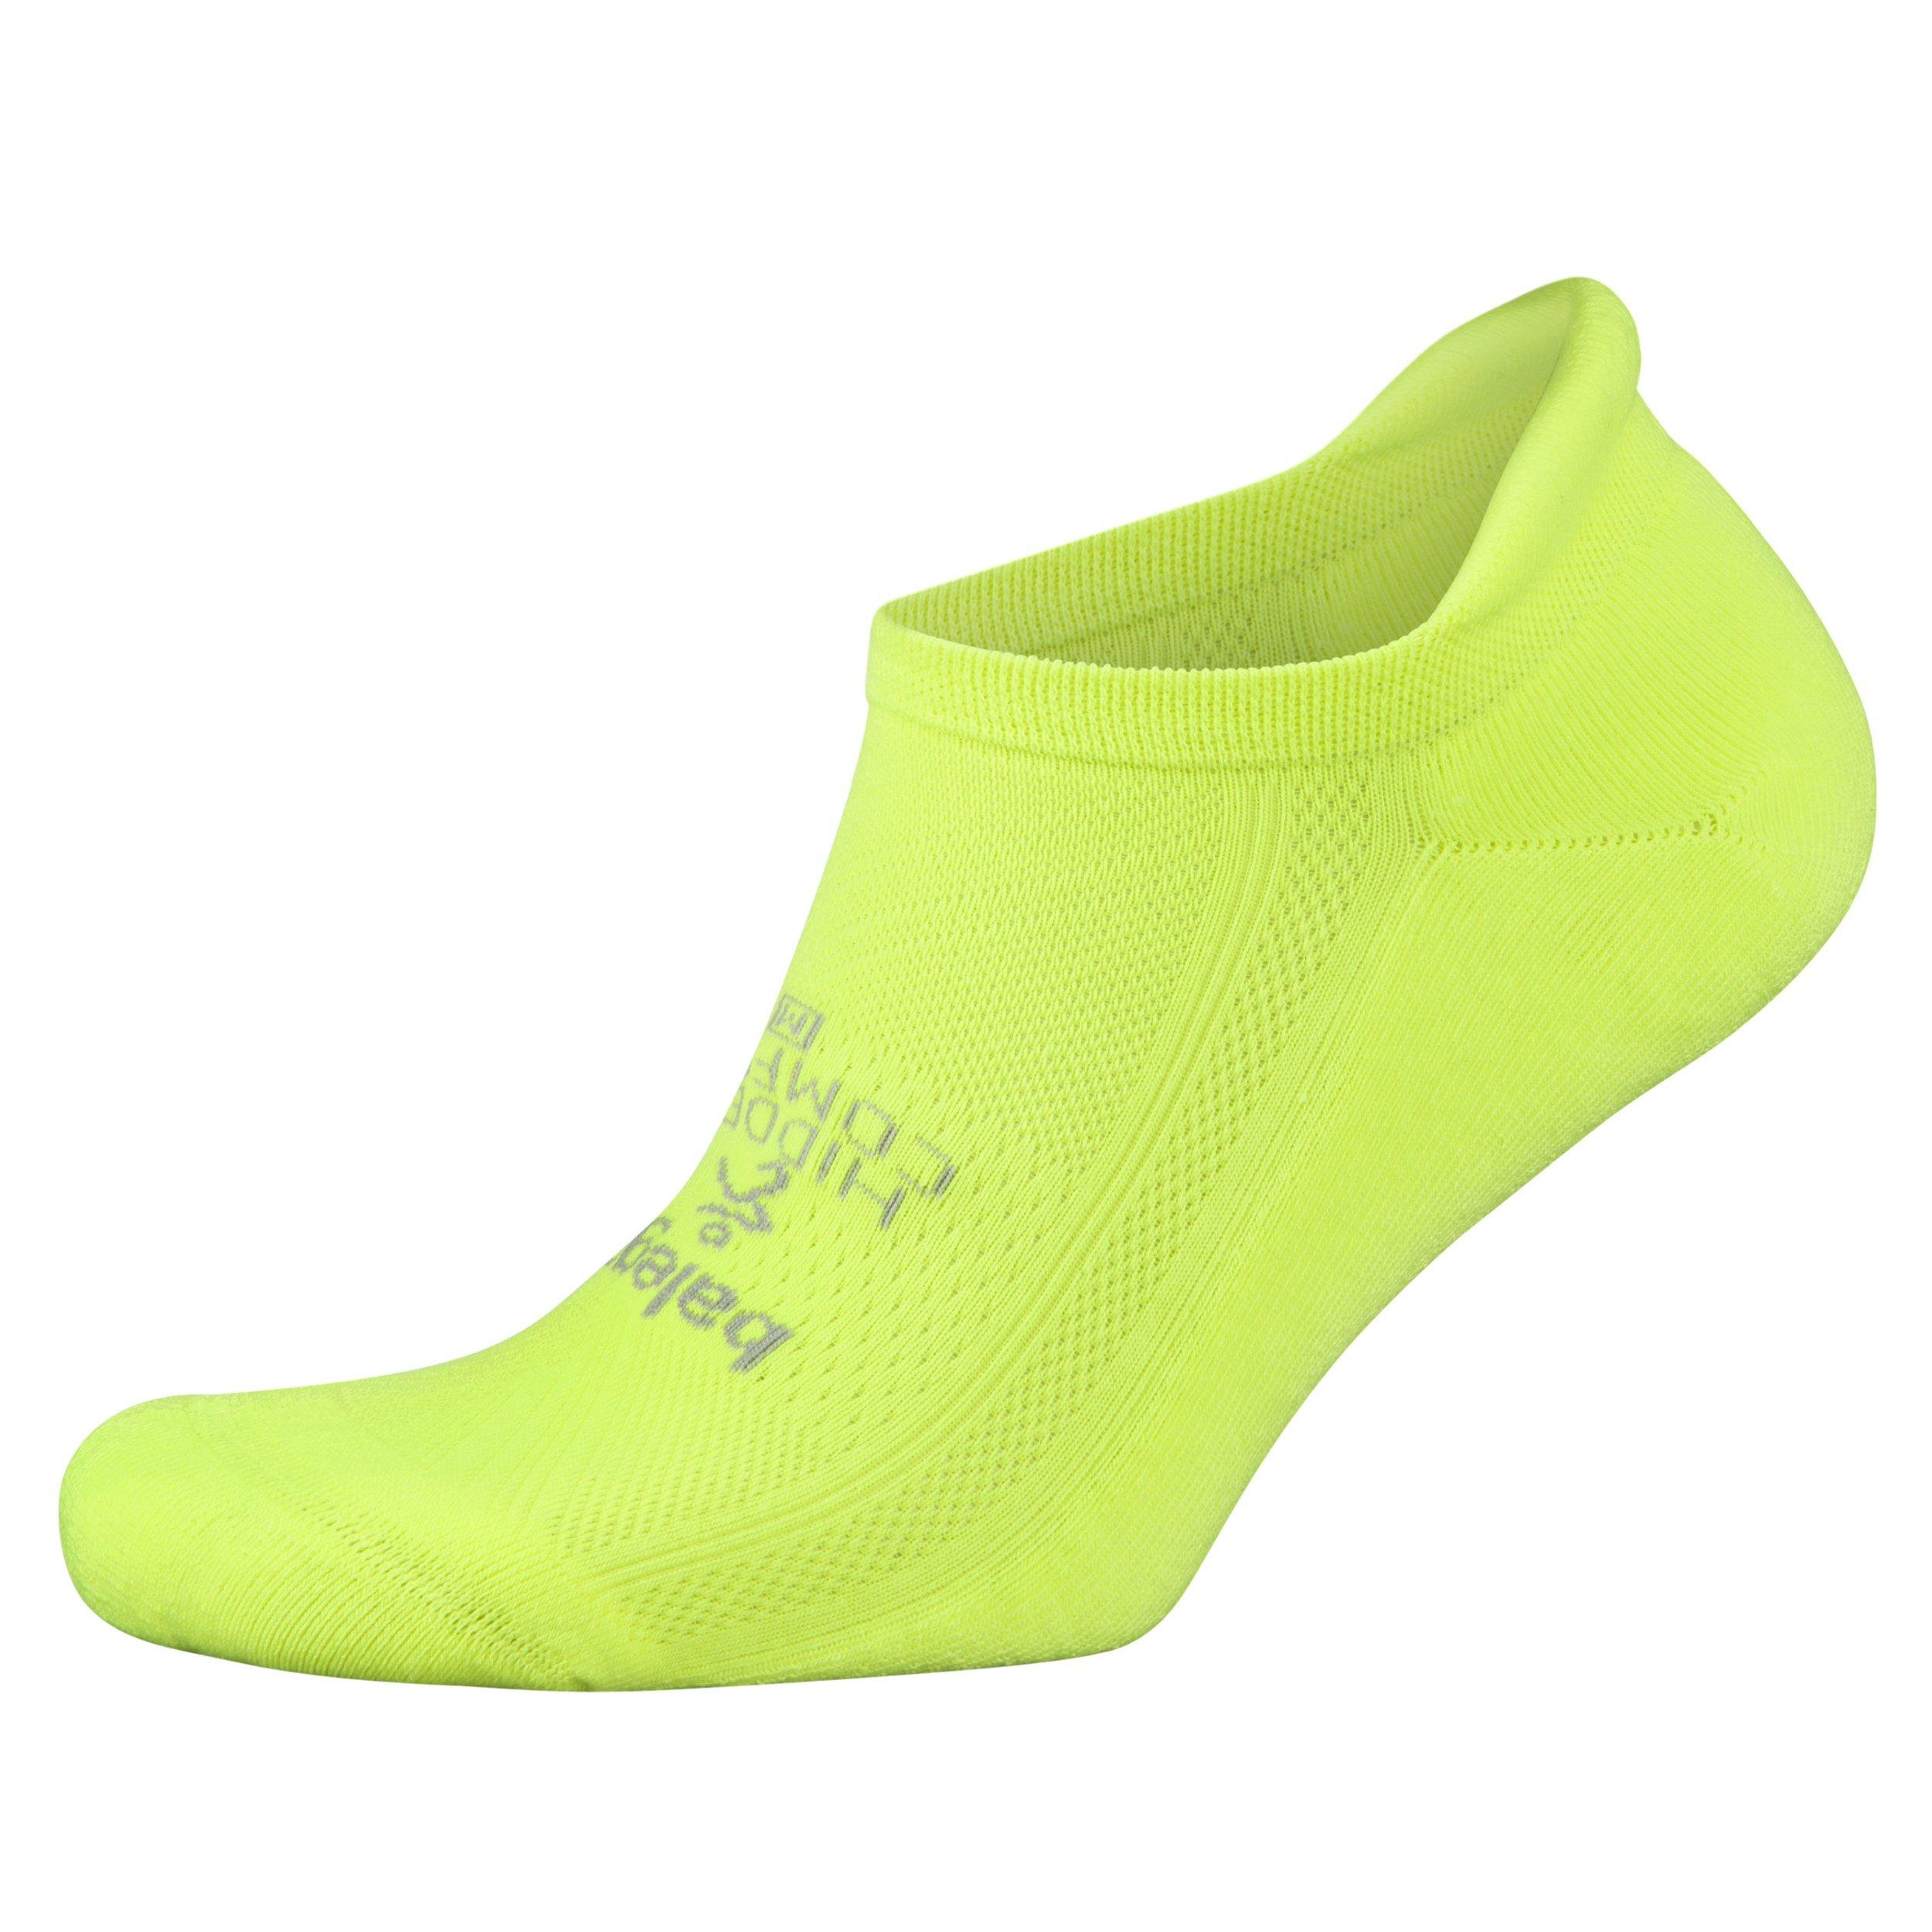 Balega Hidden Comfort Athletic No Show Running Socks for Men and Women with Seamless Toe, (Small) - Zest Lemon